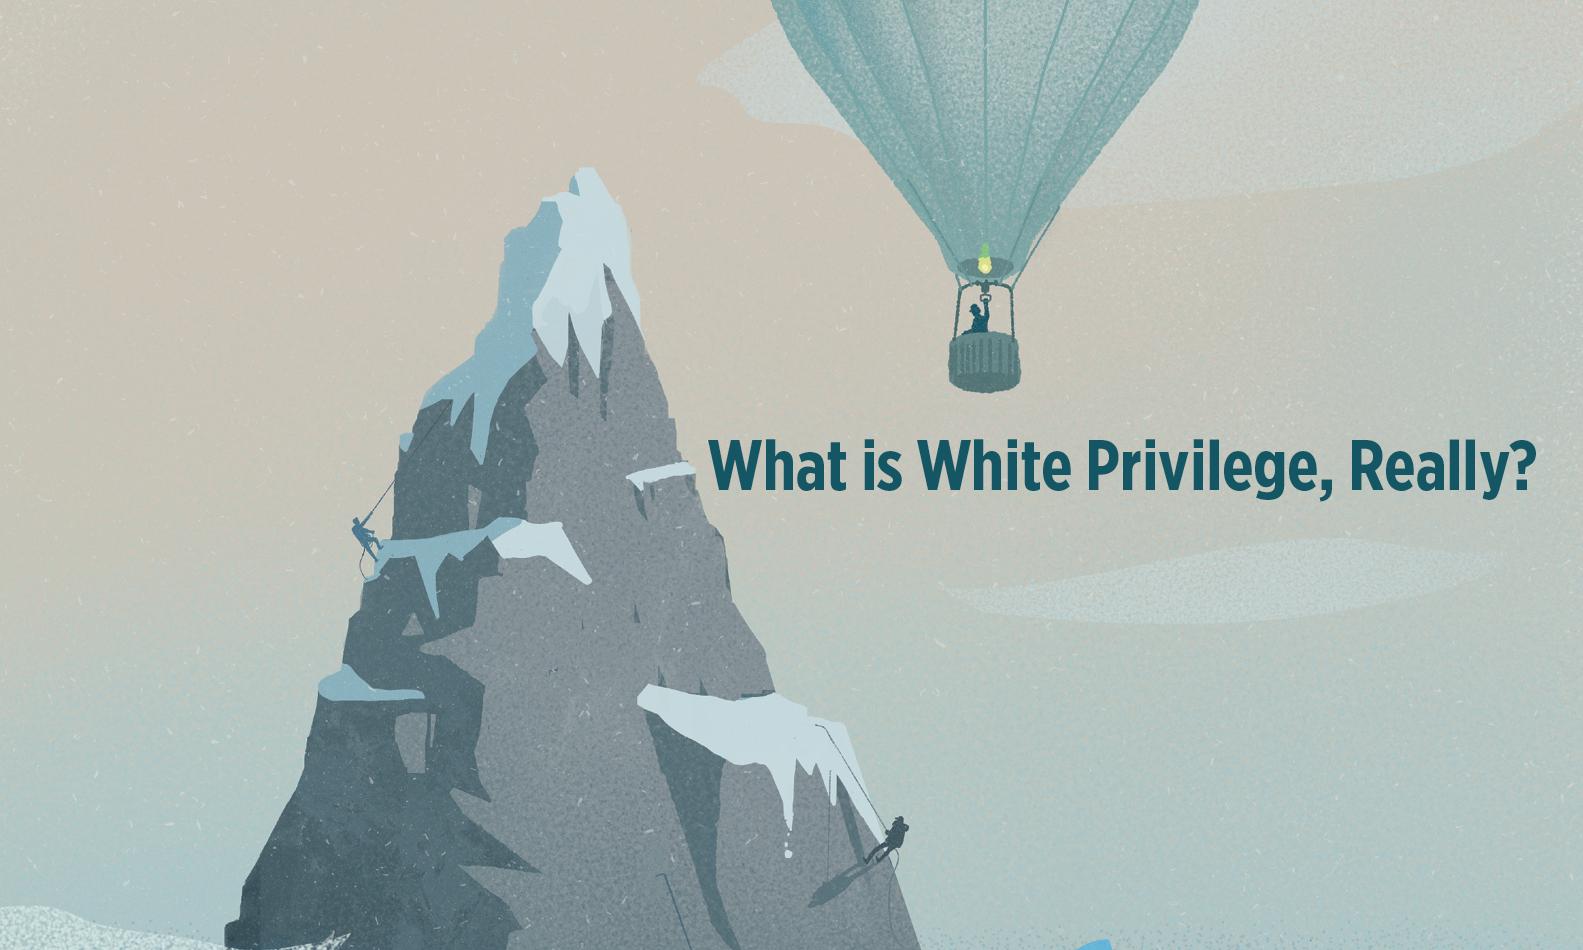 What is White Privilege webinar 1 tolerance pic